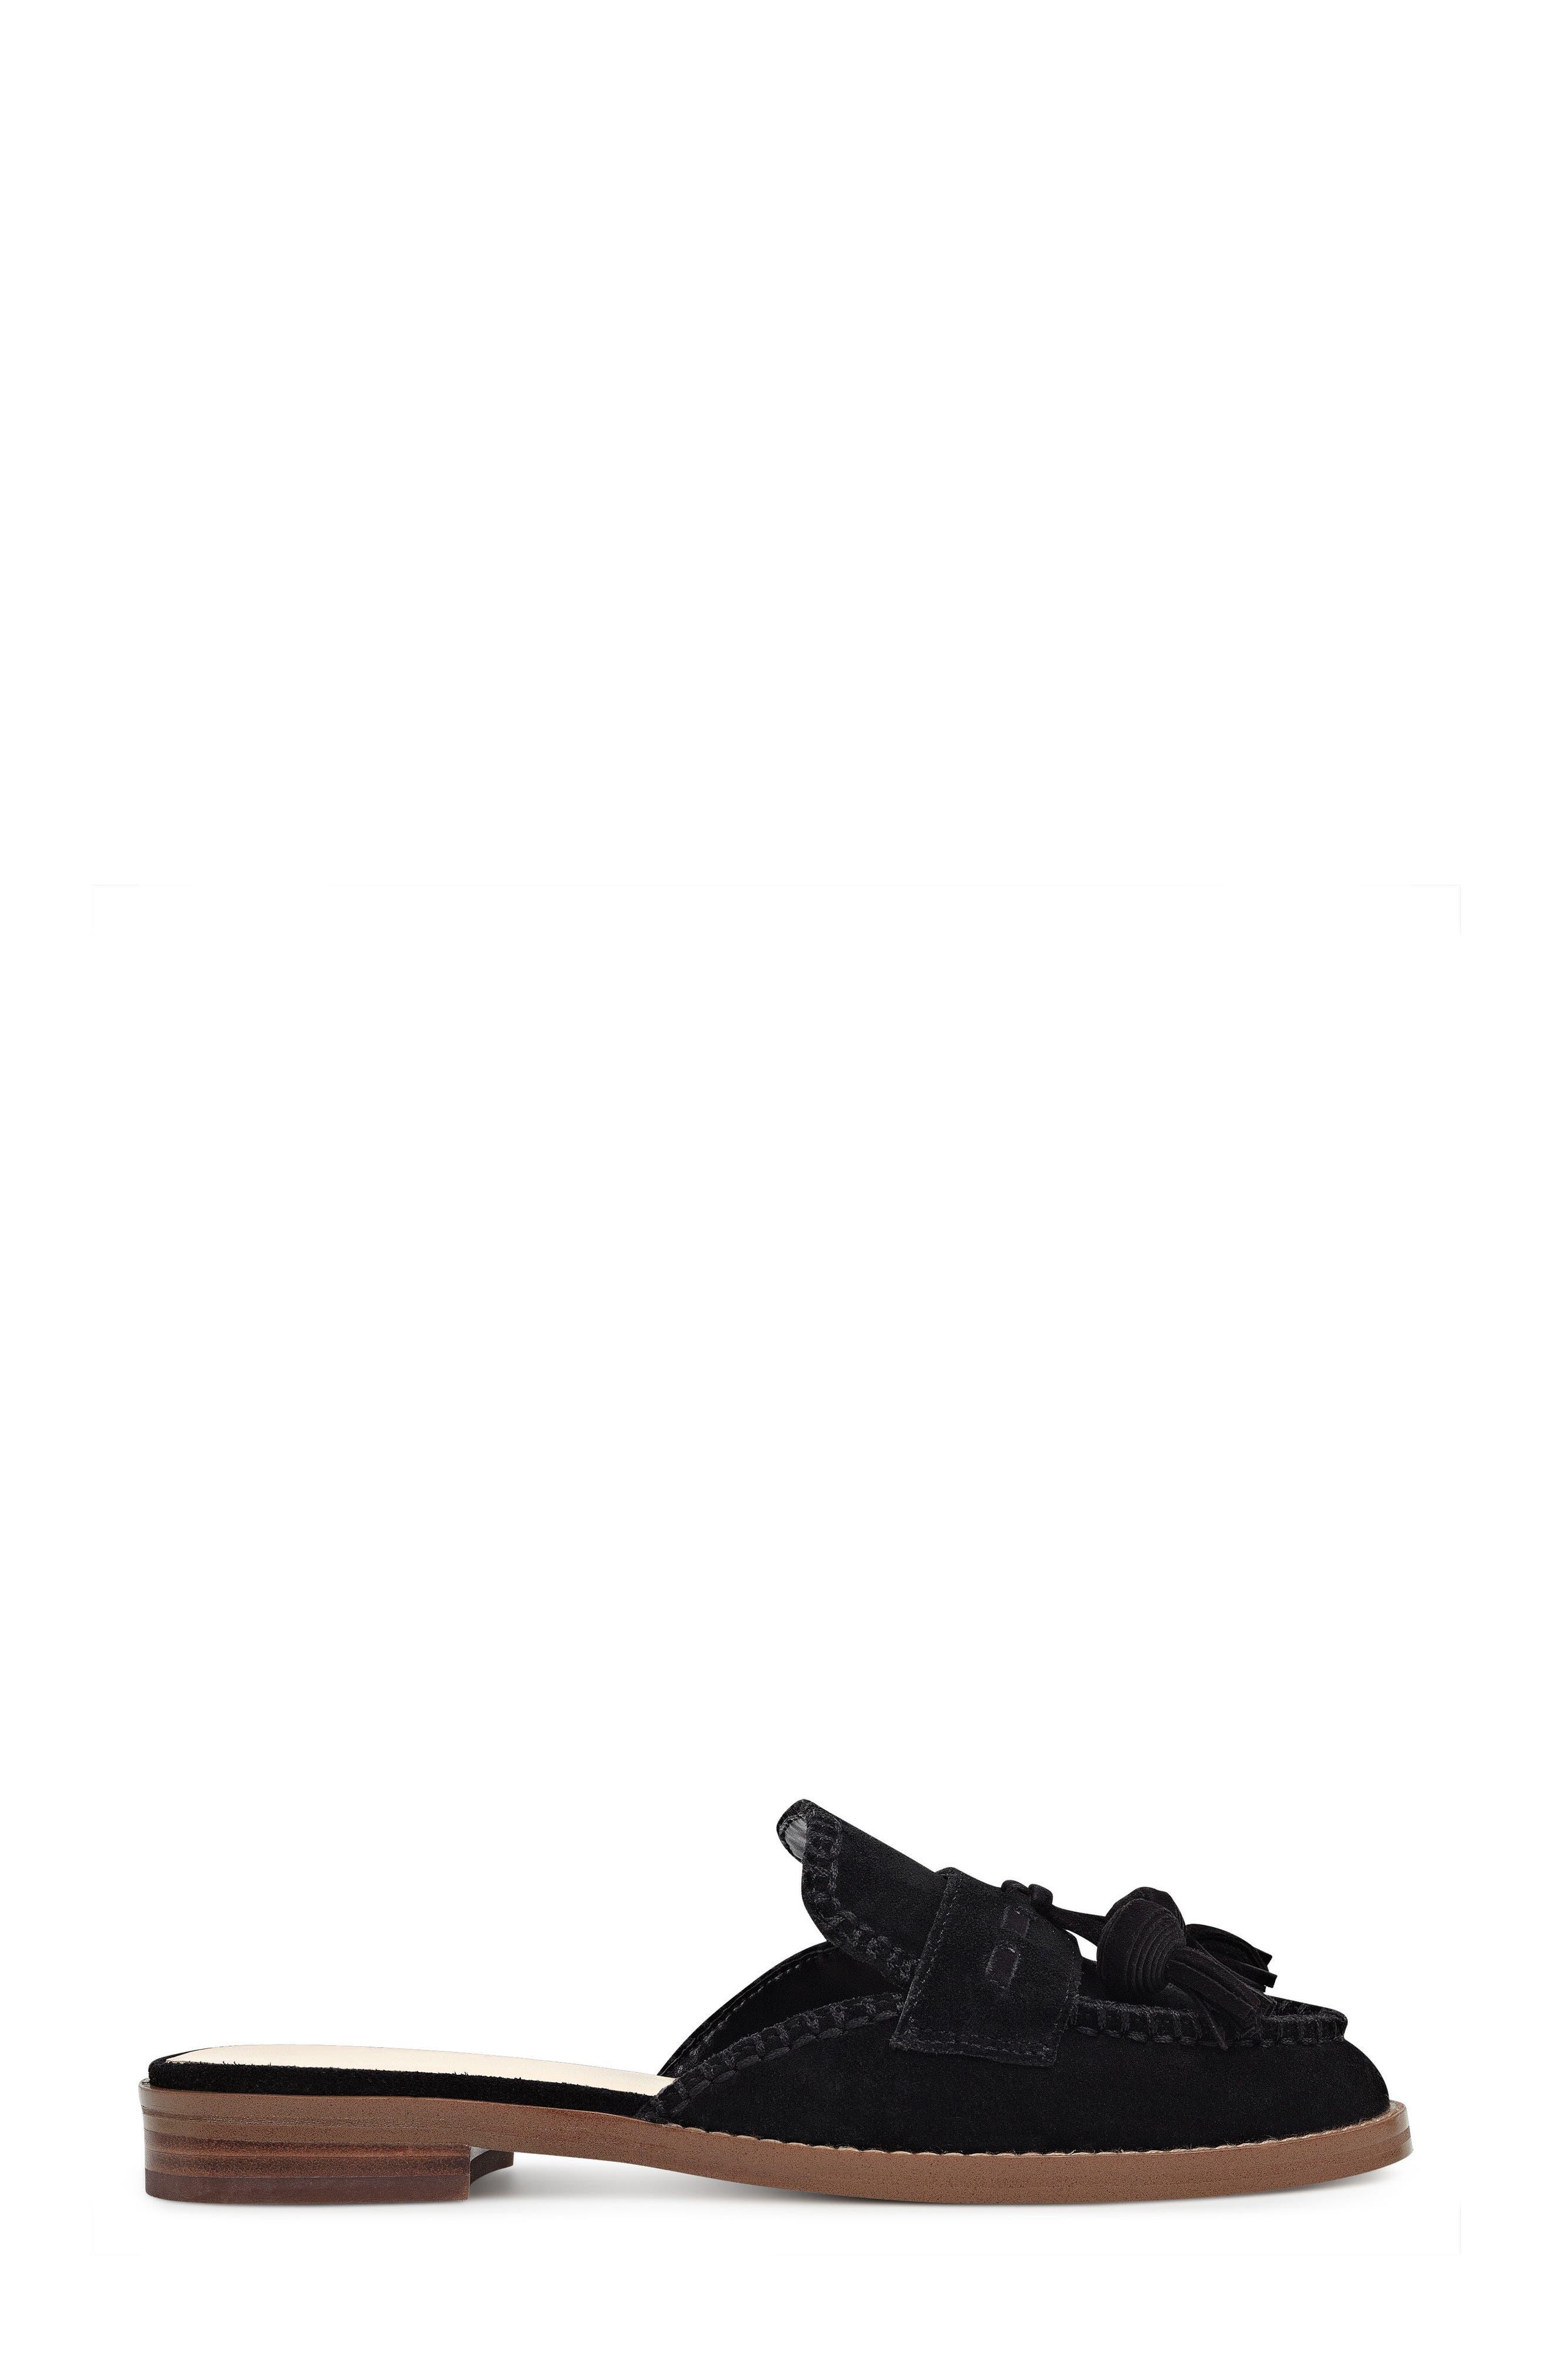 Vesuvio Tassel Loafer Mule,                             Alternate thumbnail 3, color,                             001